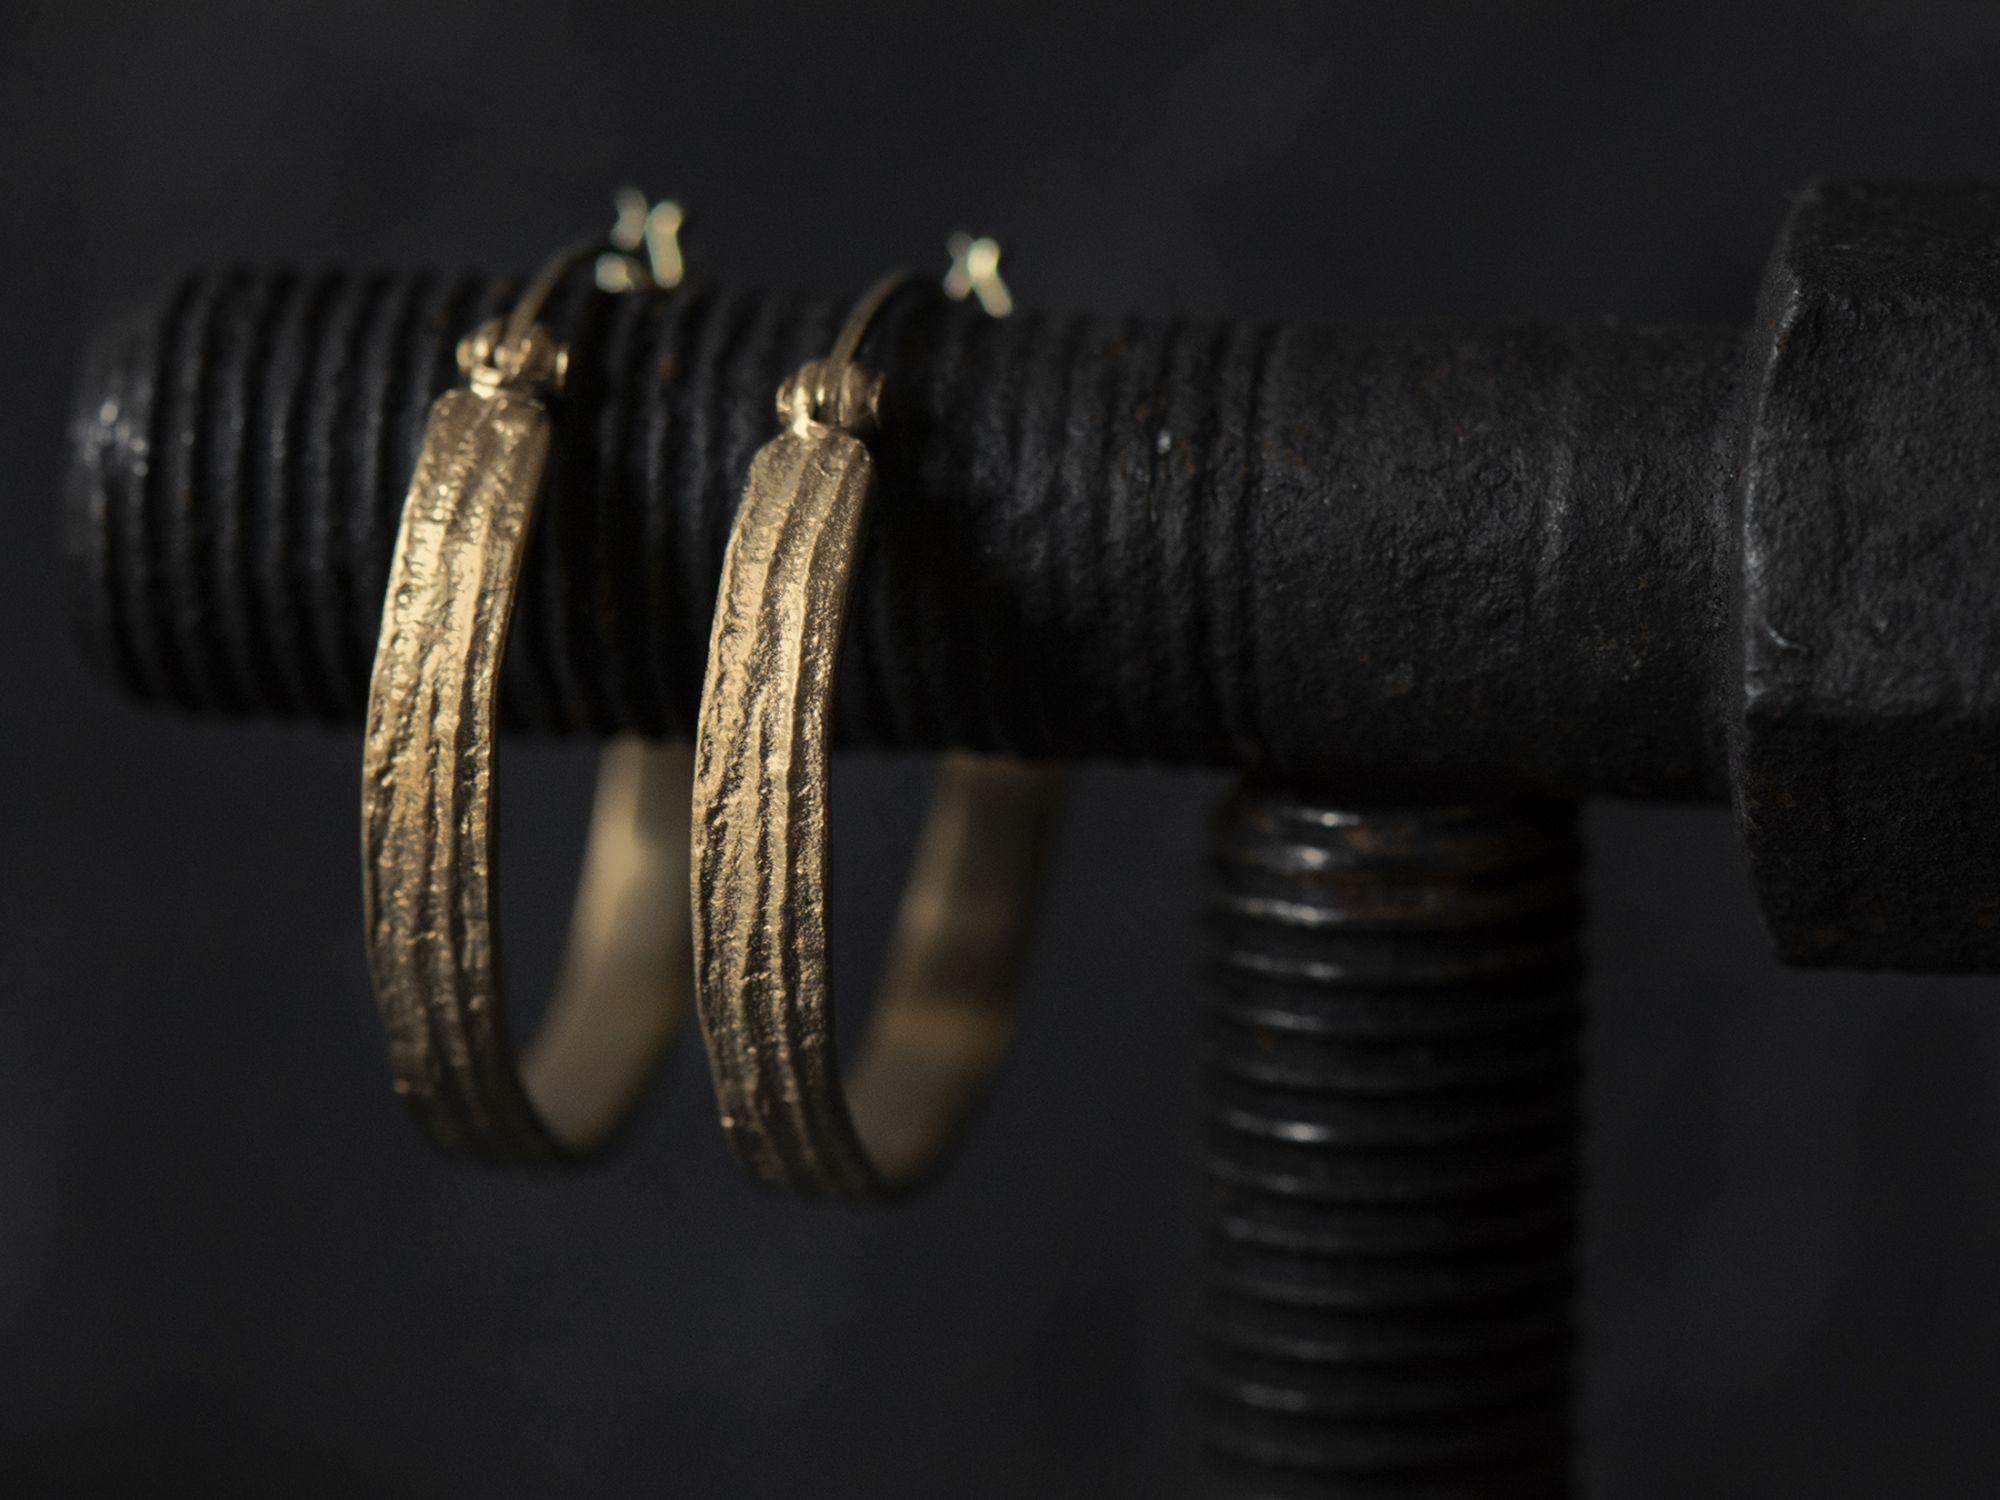 Sitia small vermeil hoop earrings by Emmanuelle Zysman